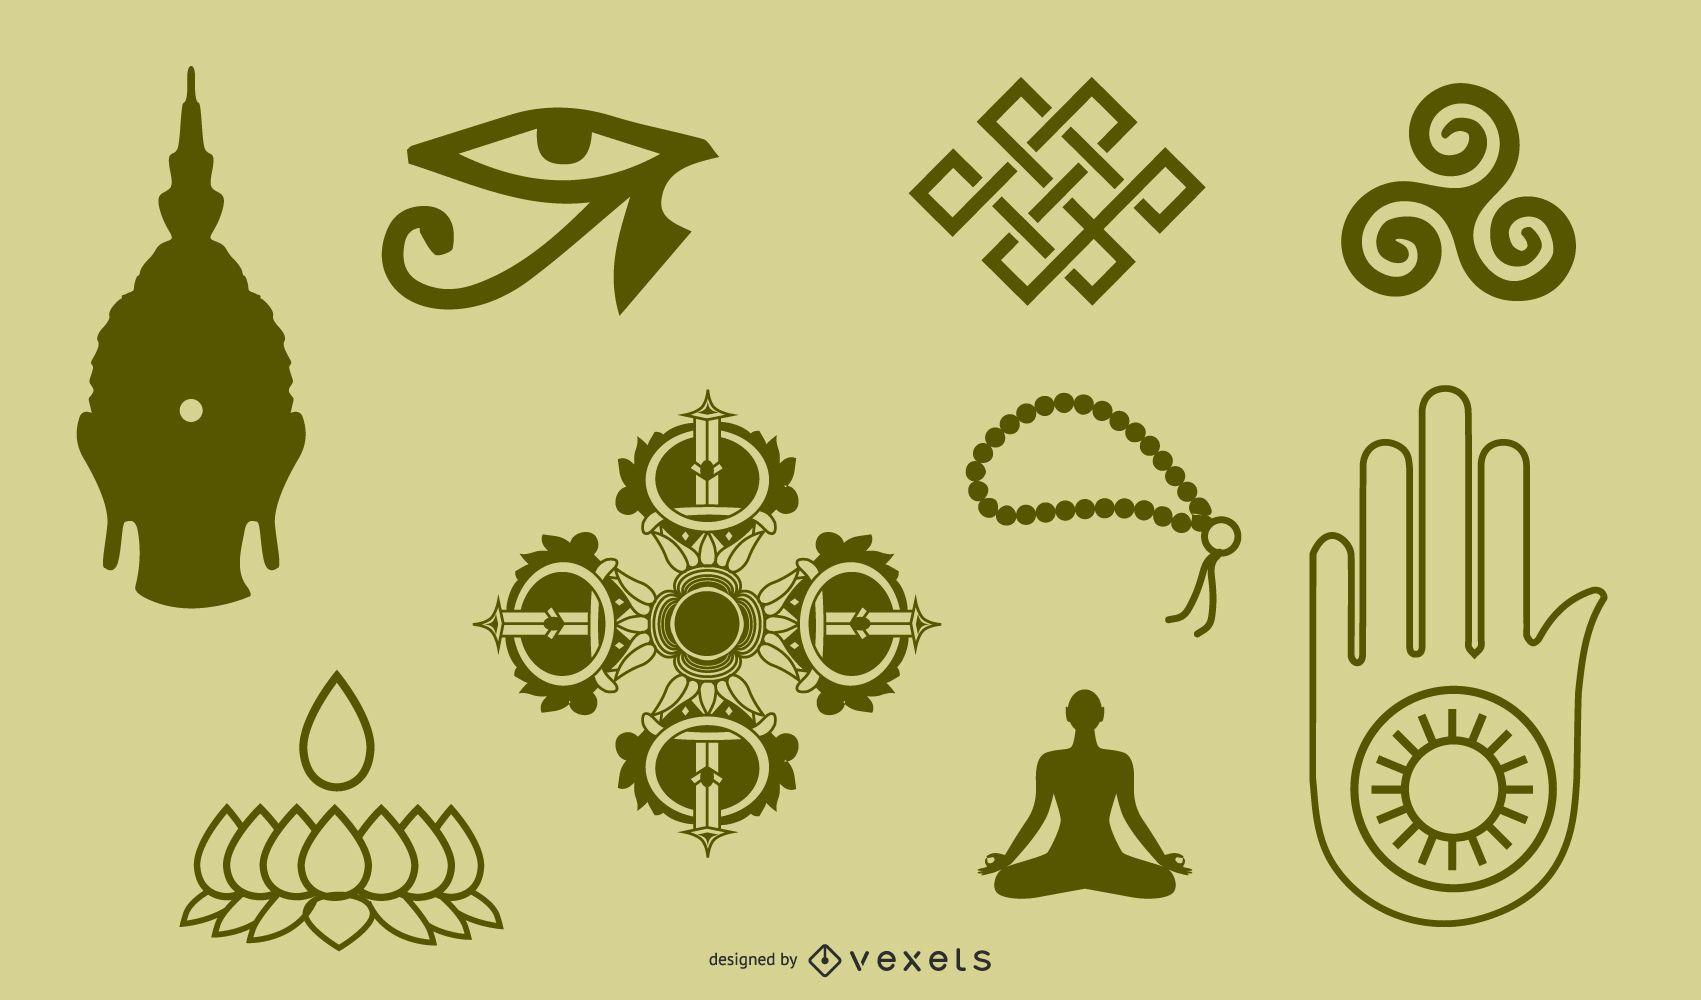 Tibetan Buddhist Symbols And Objects Figure Of Twelve Handheld